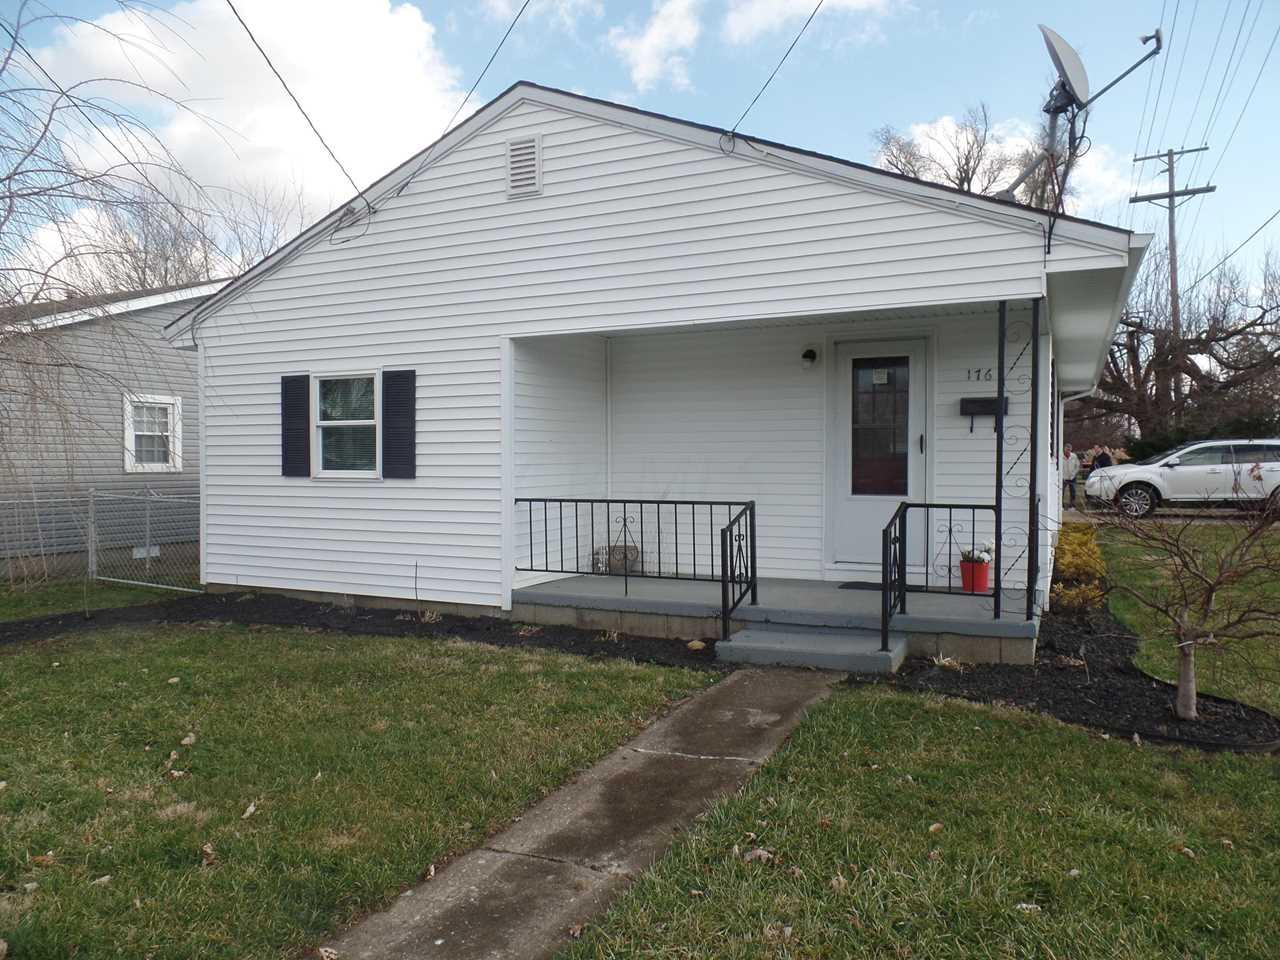 176 Obannon Avenue Newark, OH 43055   MLS 219000764 Photo 1